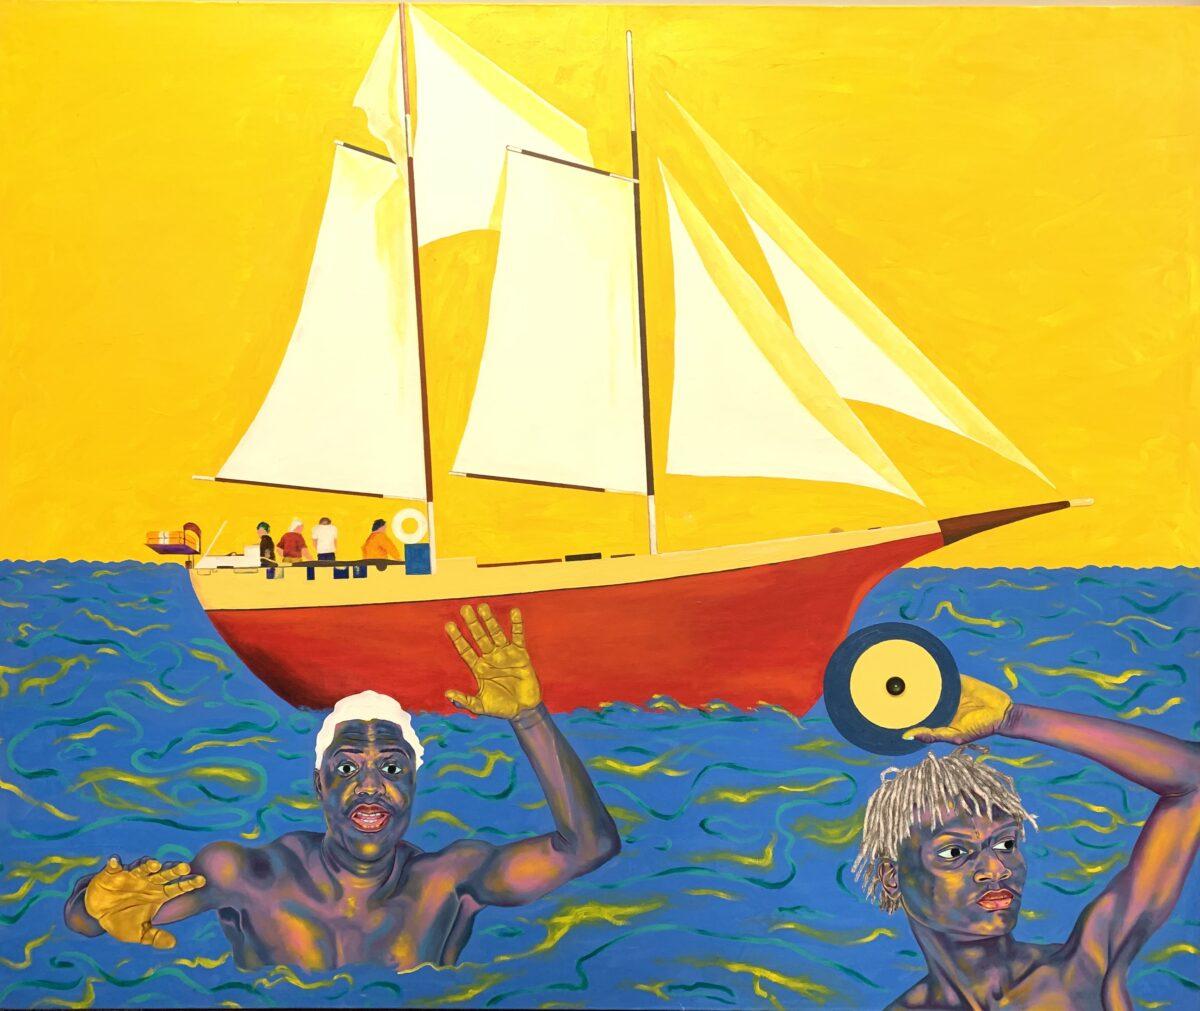 Culture Fix: African Art and Culture (September 13 – 19, 2020)